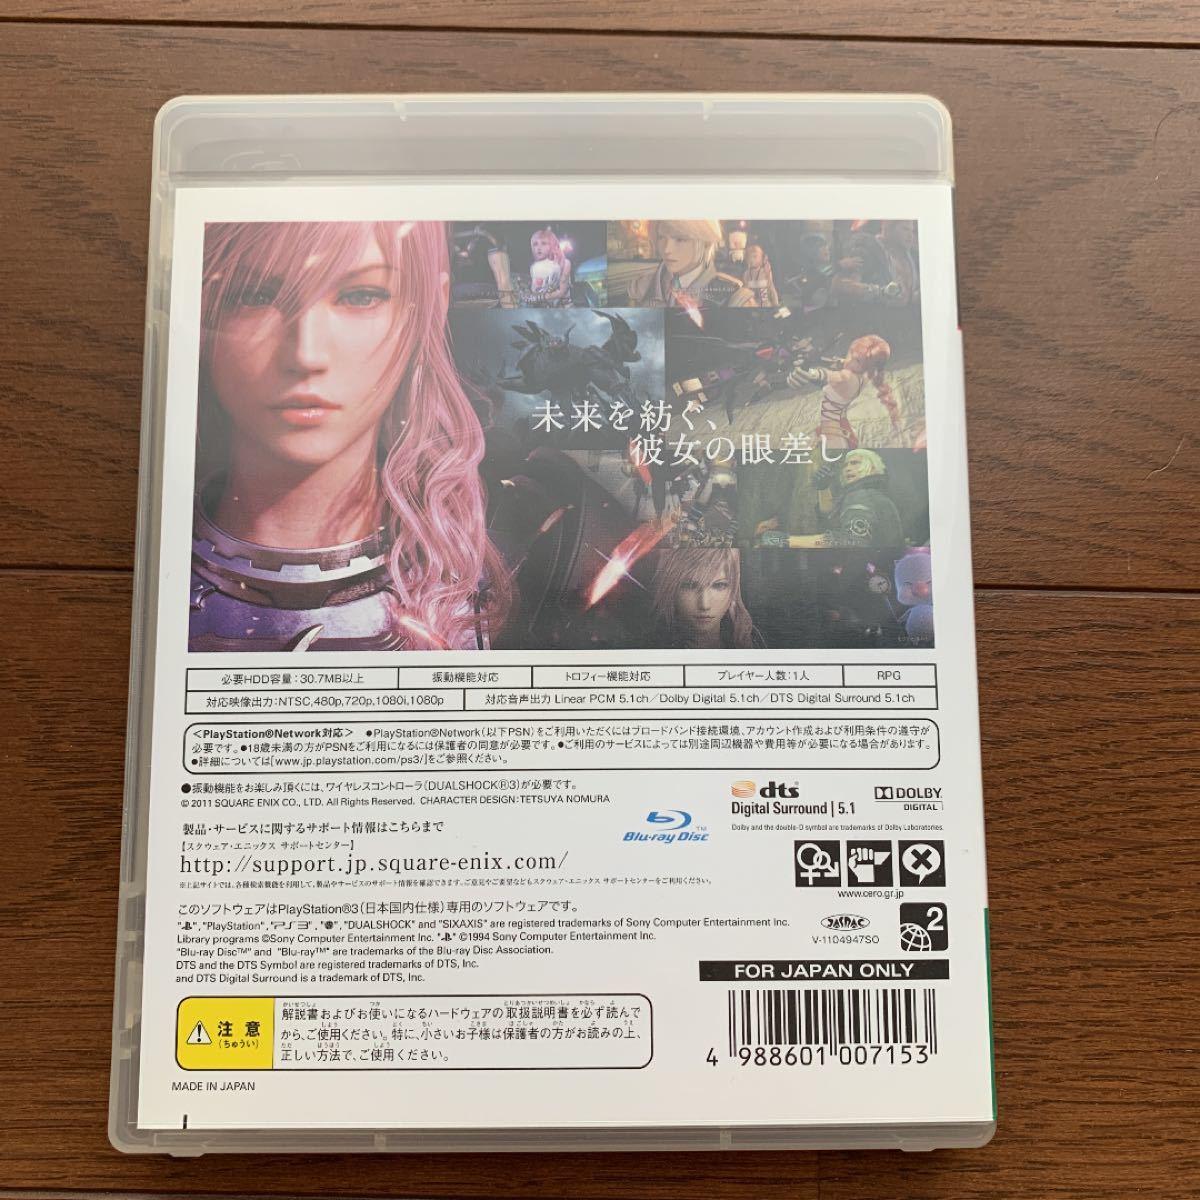 【PS3】 ファイナルファンタジー13-2 (FINAL FANTASY XIII-2) [通常版]